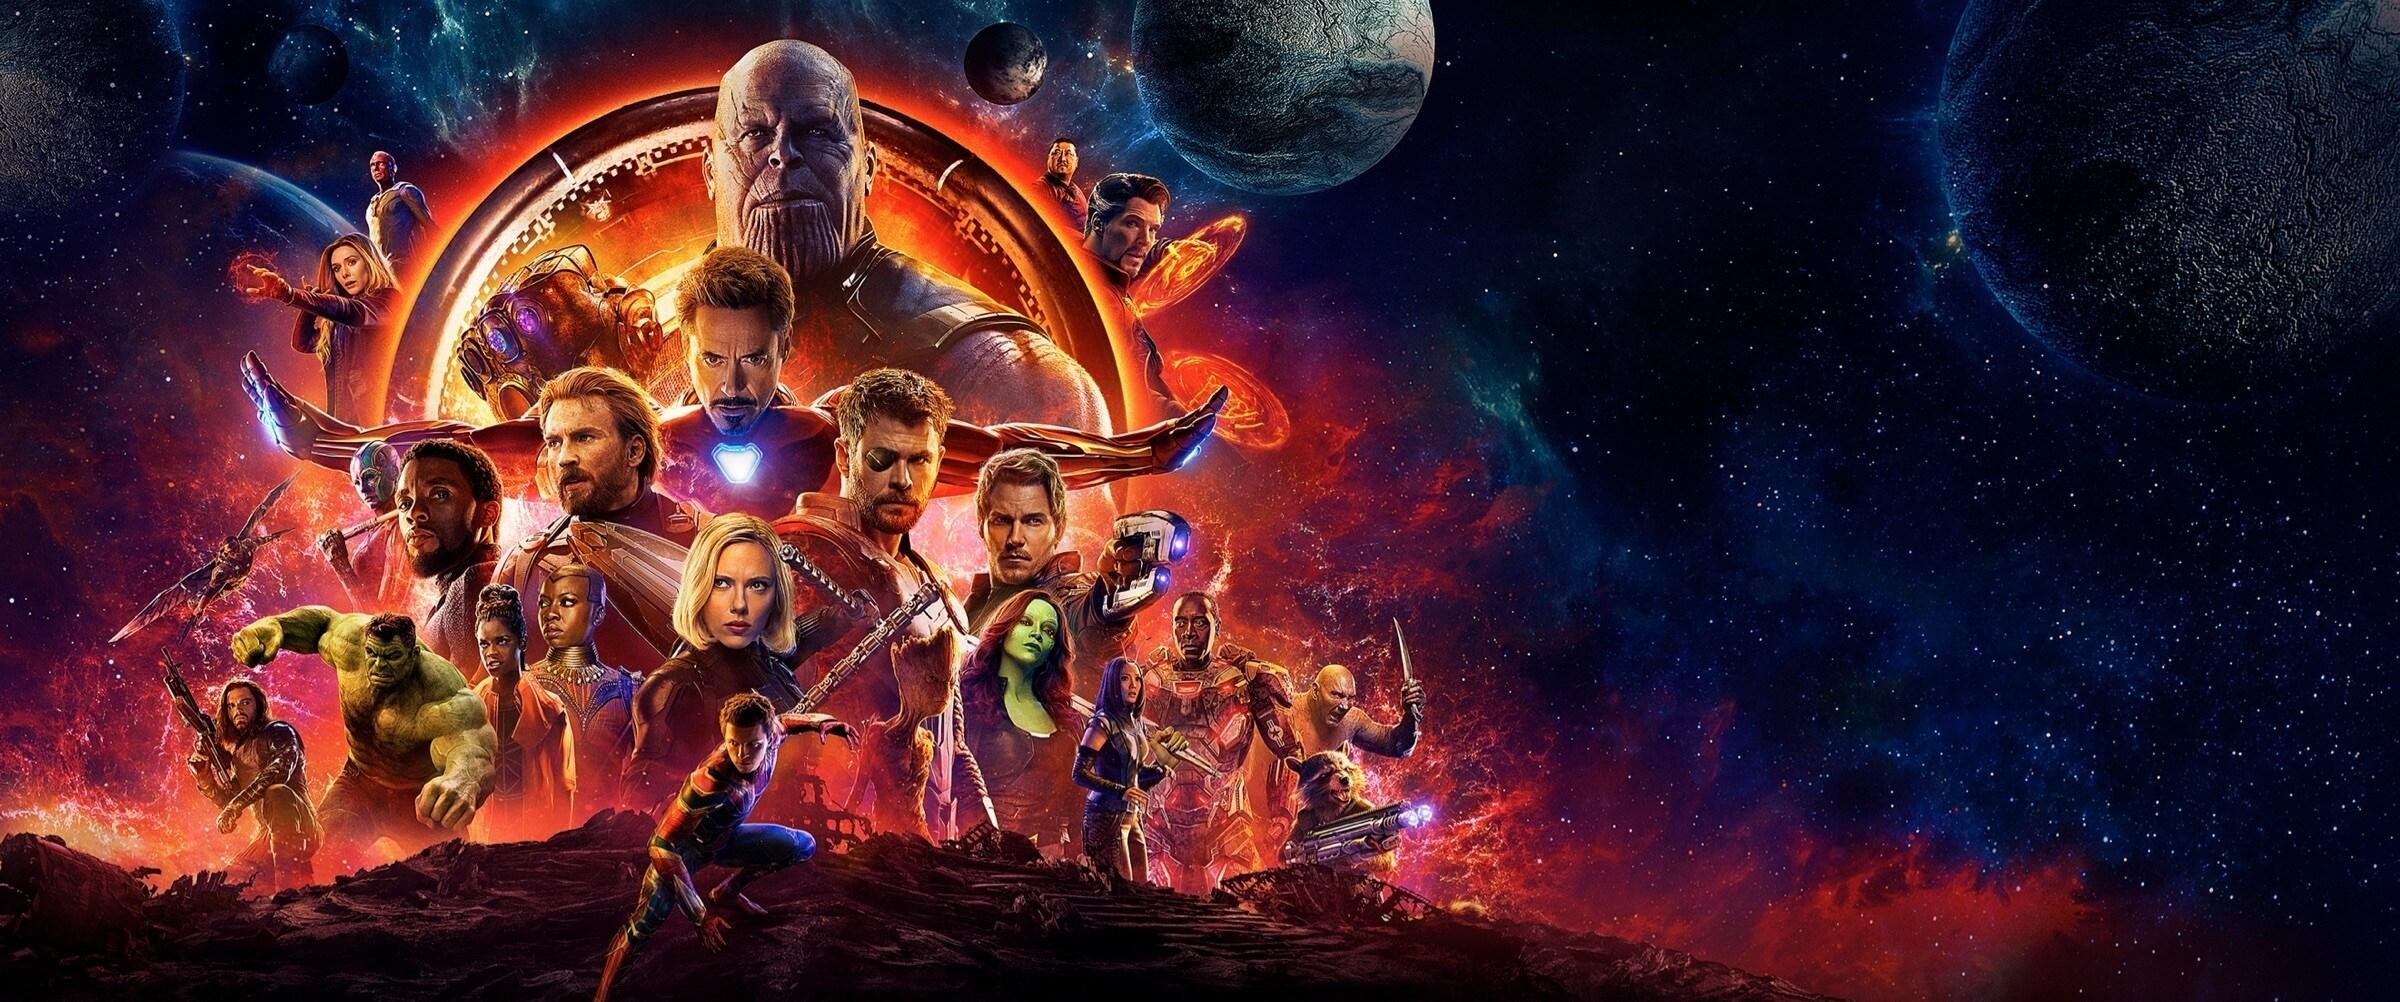 Avengers: Infinity War | Teaser Trailer